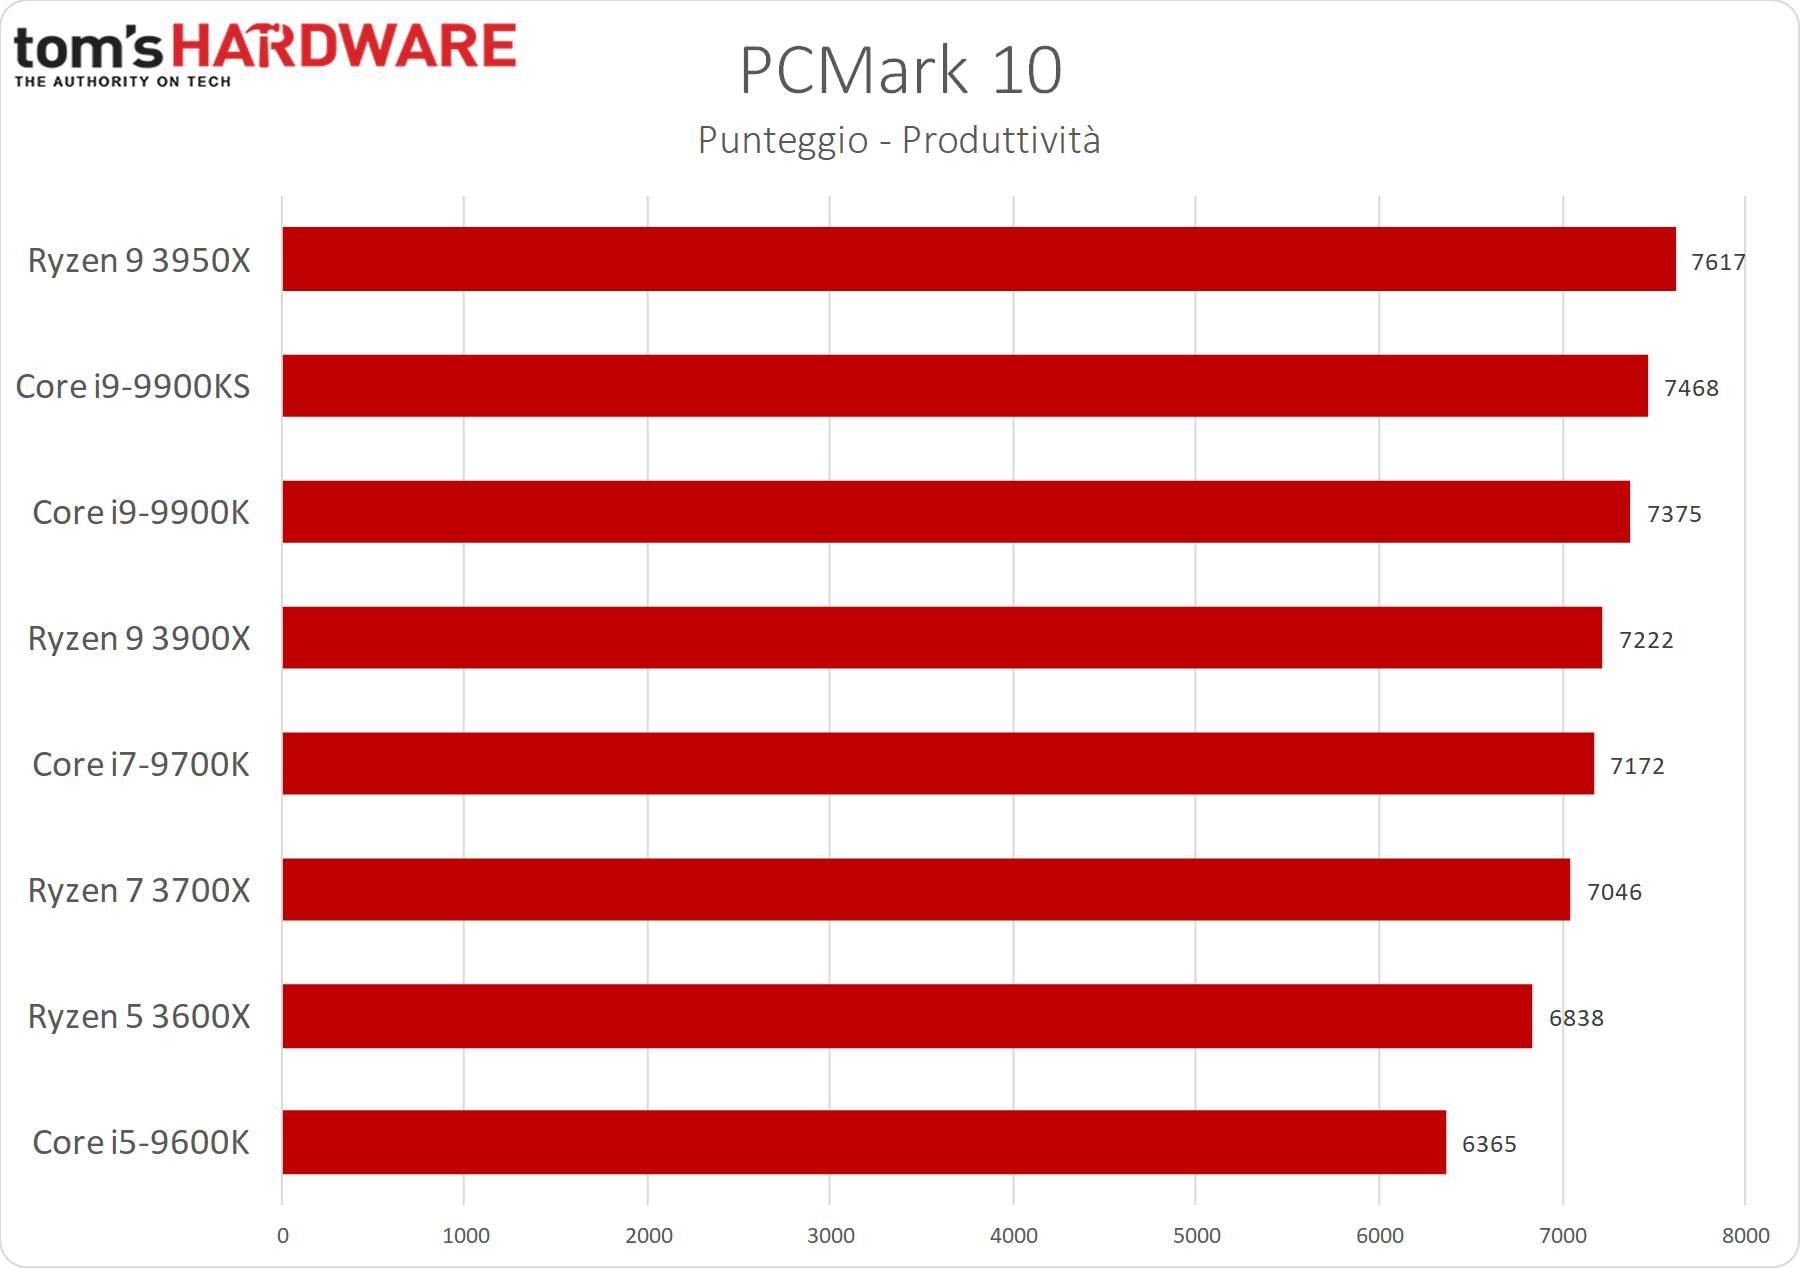 PCMark 10